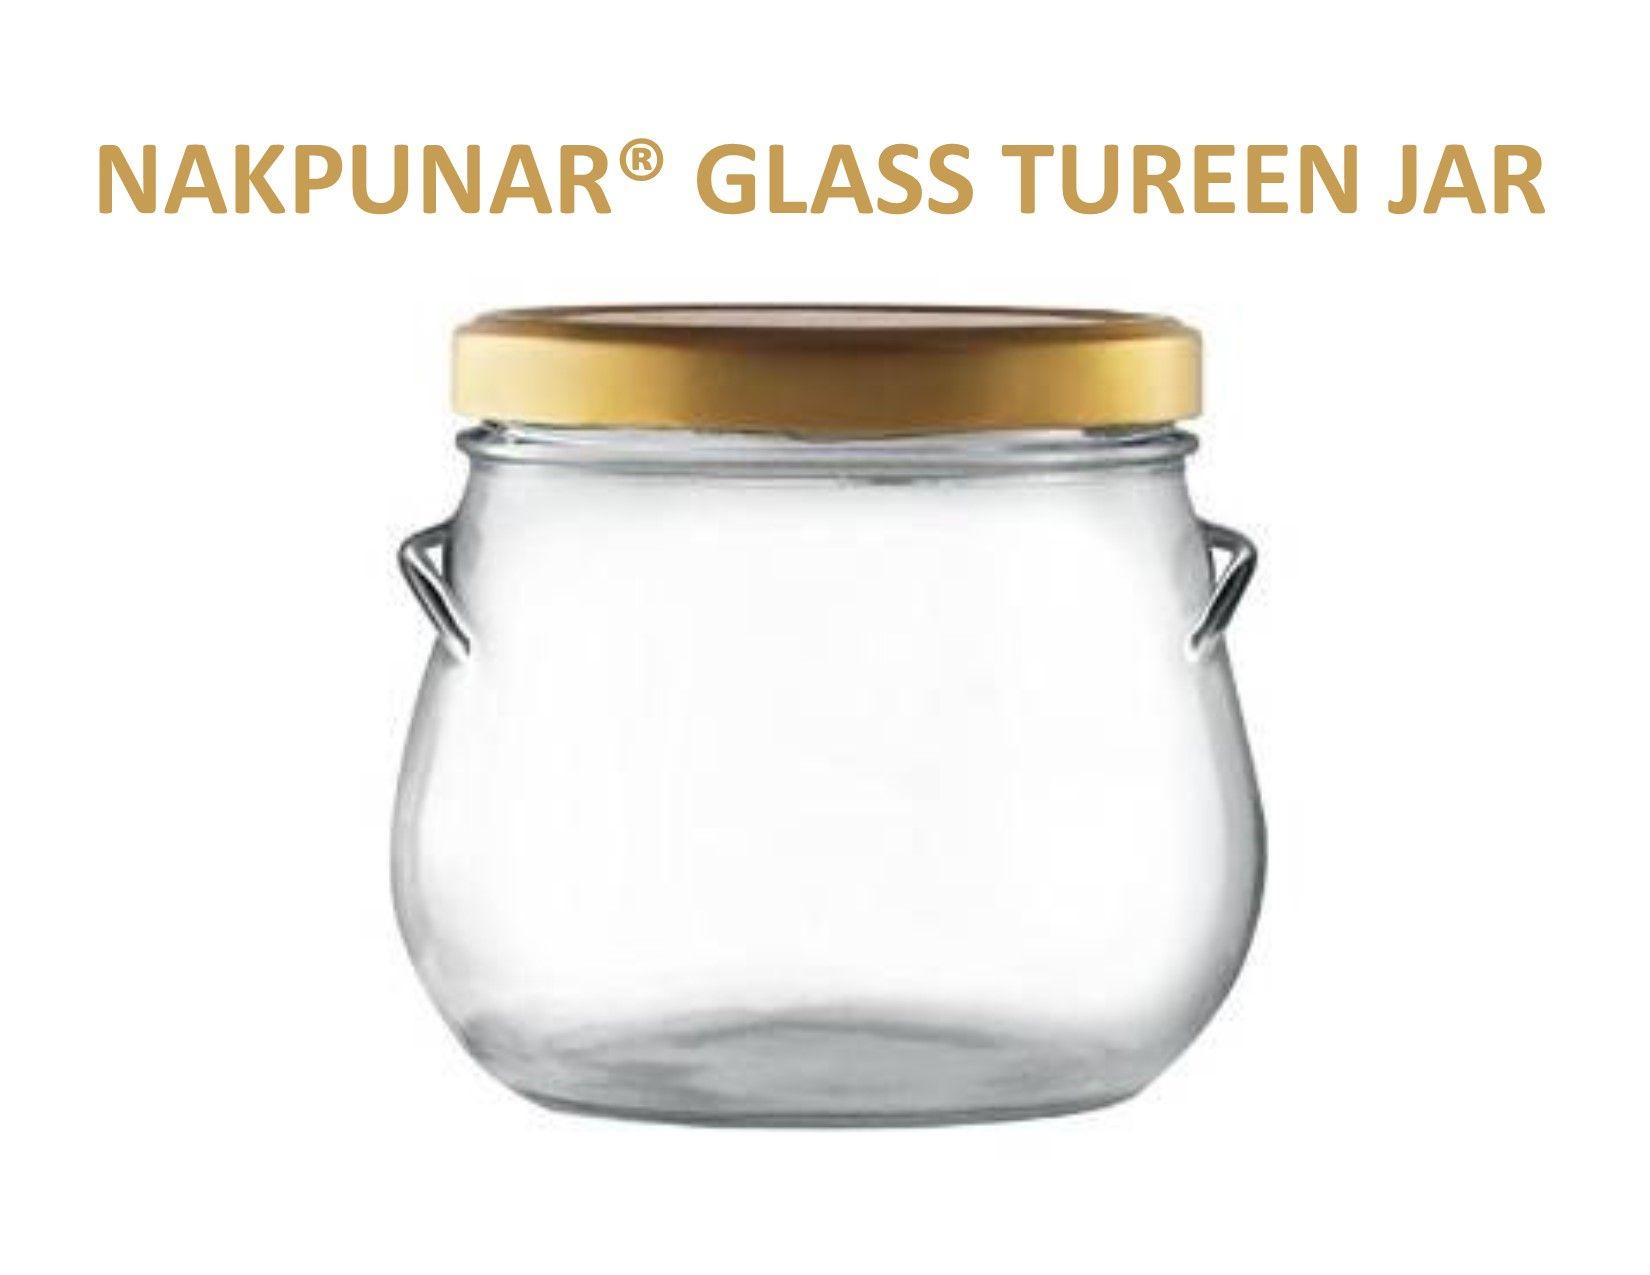 3bde9ff5f1cb Glass Tureen Jar - 29 Oz (850 ml) Nakpunar® Brand Glass Tureen Jars ...